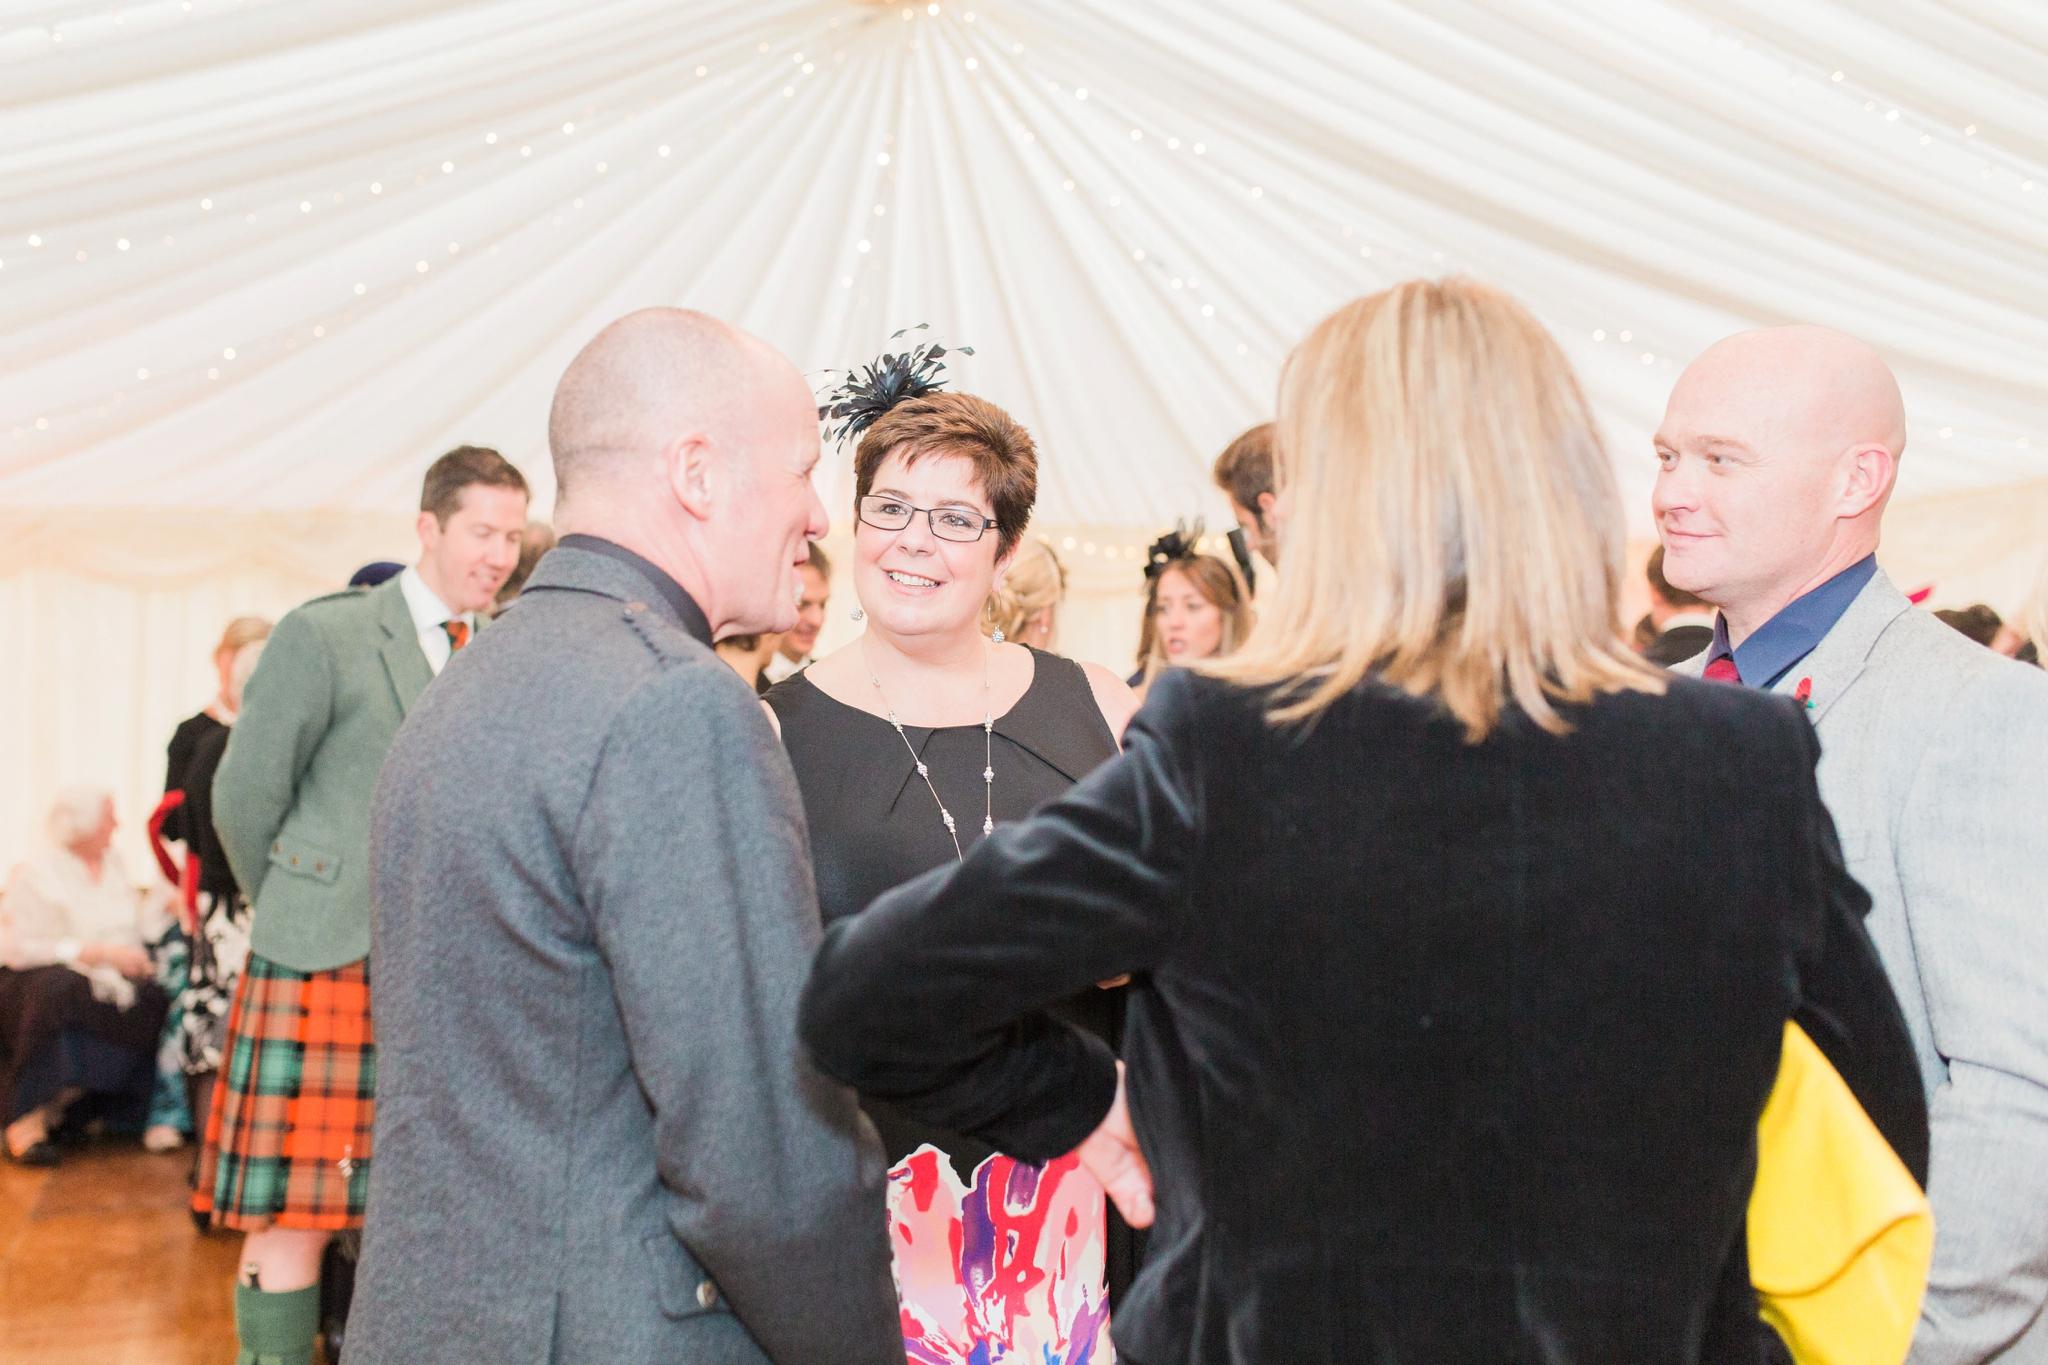 Suzanne_li_photography_kirknewton_wedding_0054.jpg